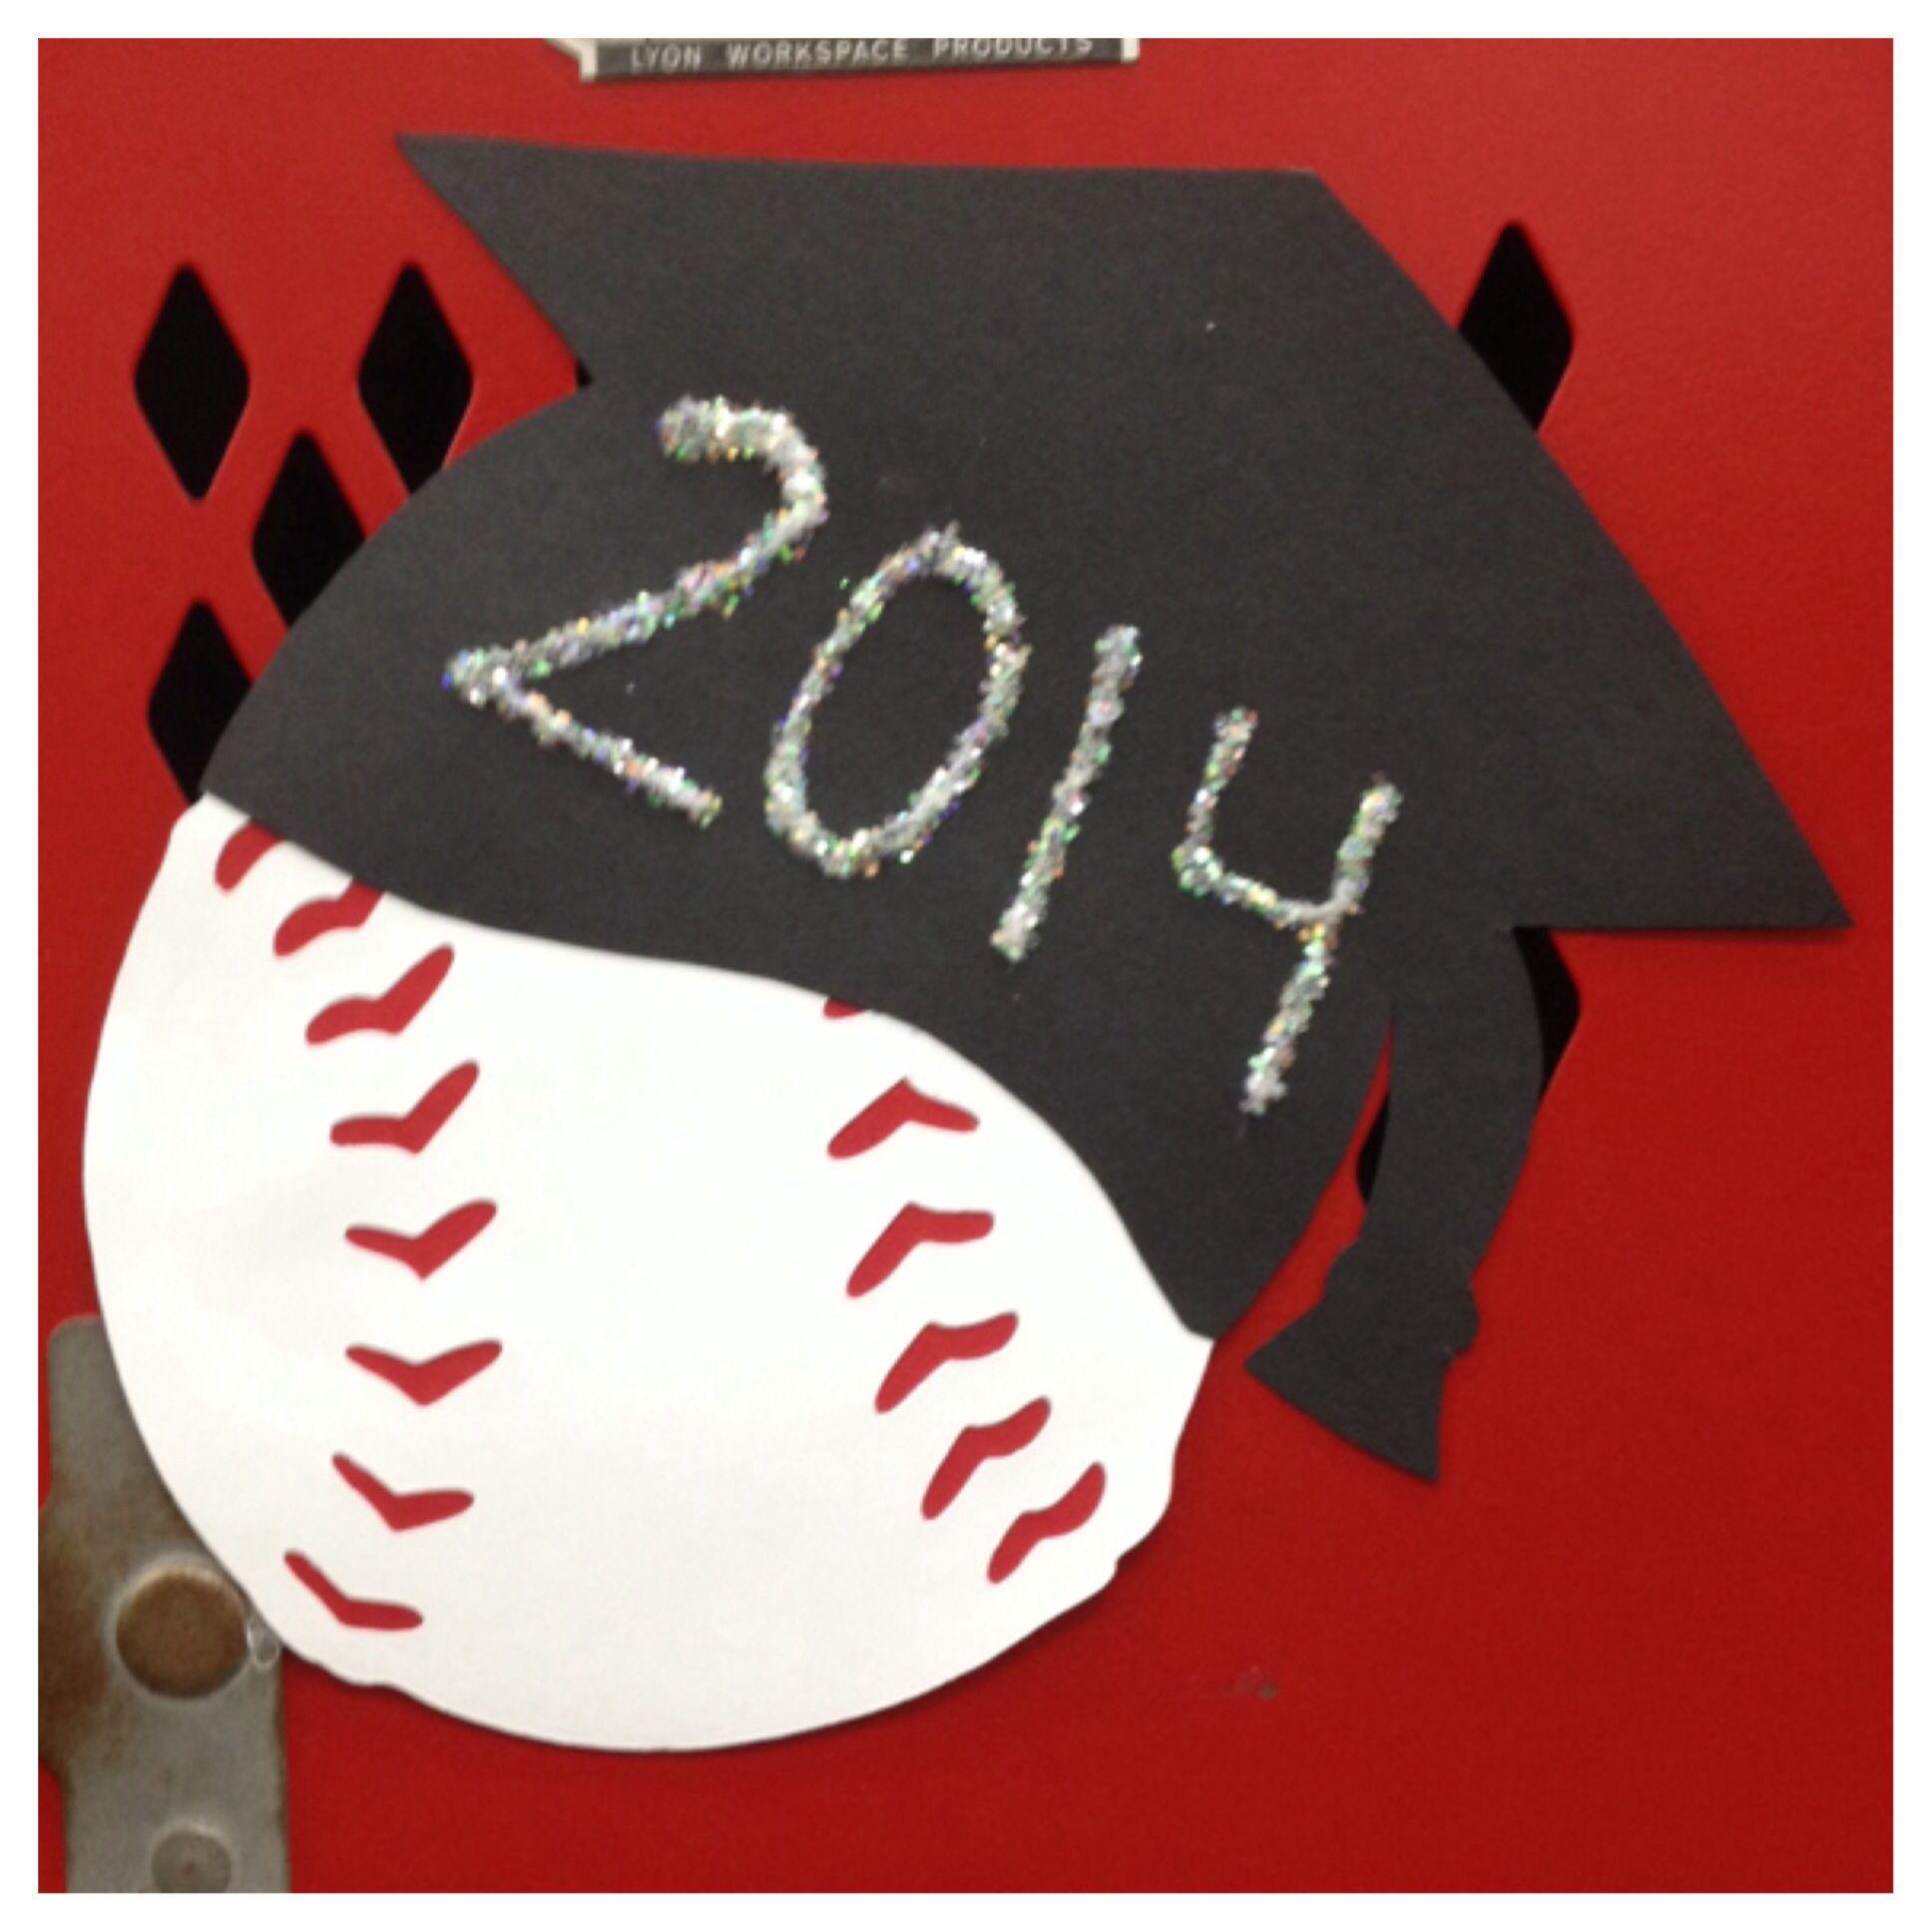 Senior Baseball Locker Decorations In Honor Of The Last Home Game Season And